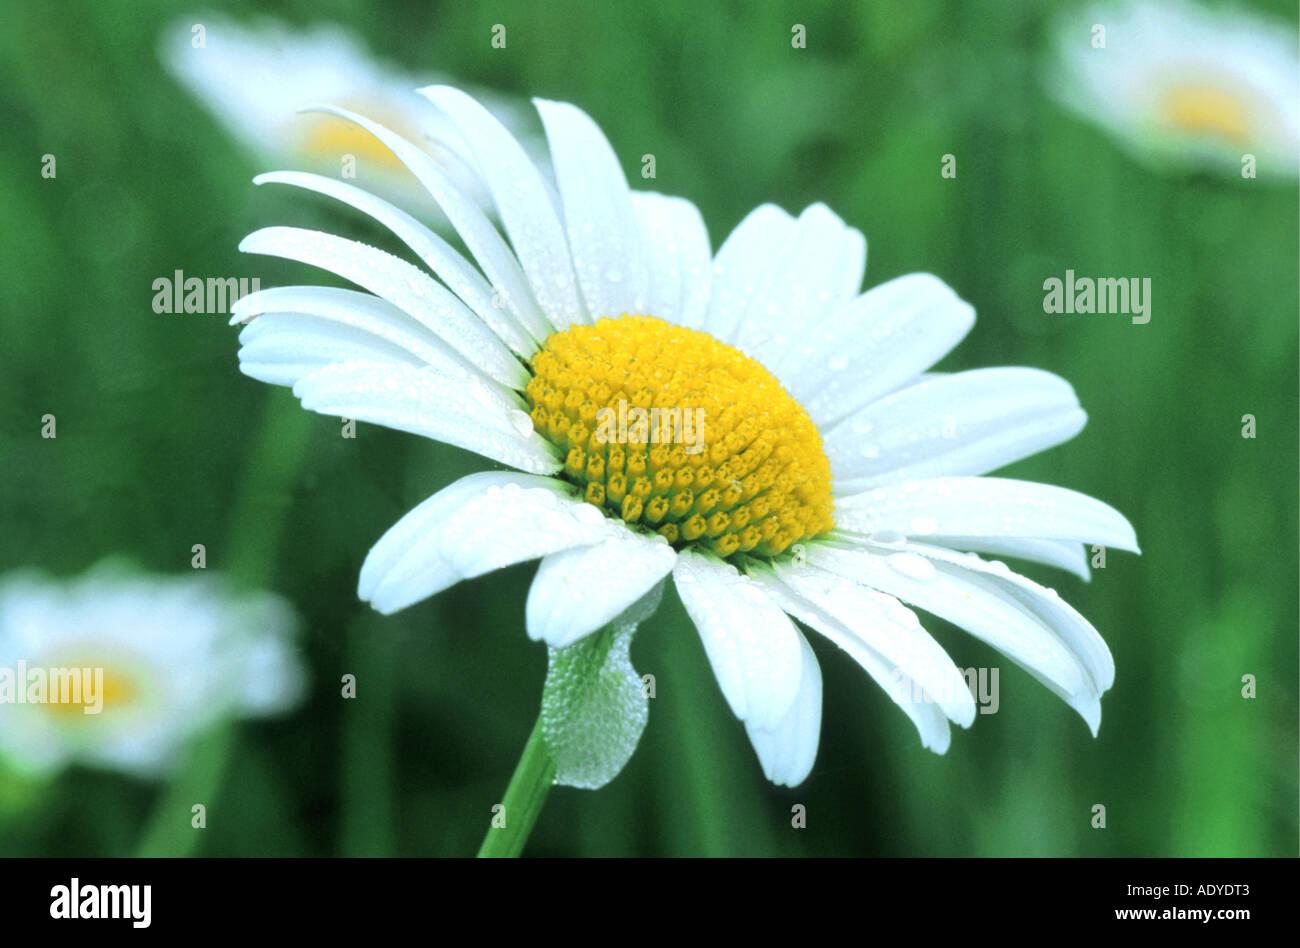 Oxeye daisy chrysanthemum leucanthemum leucanthemum vulgare stock oxeye daisy chrysanthemum leucanthemum leucanthemum vulgare flower covered in dewdrops switzerland greifensee izmirmasajfo